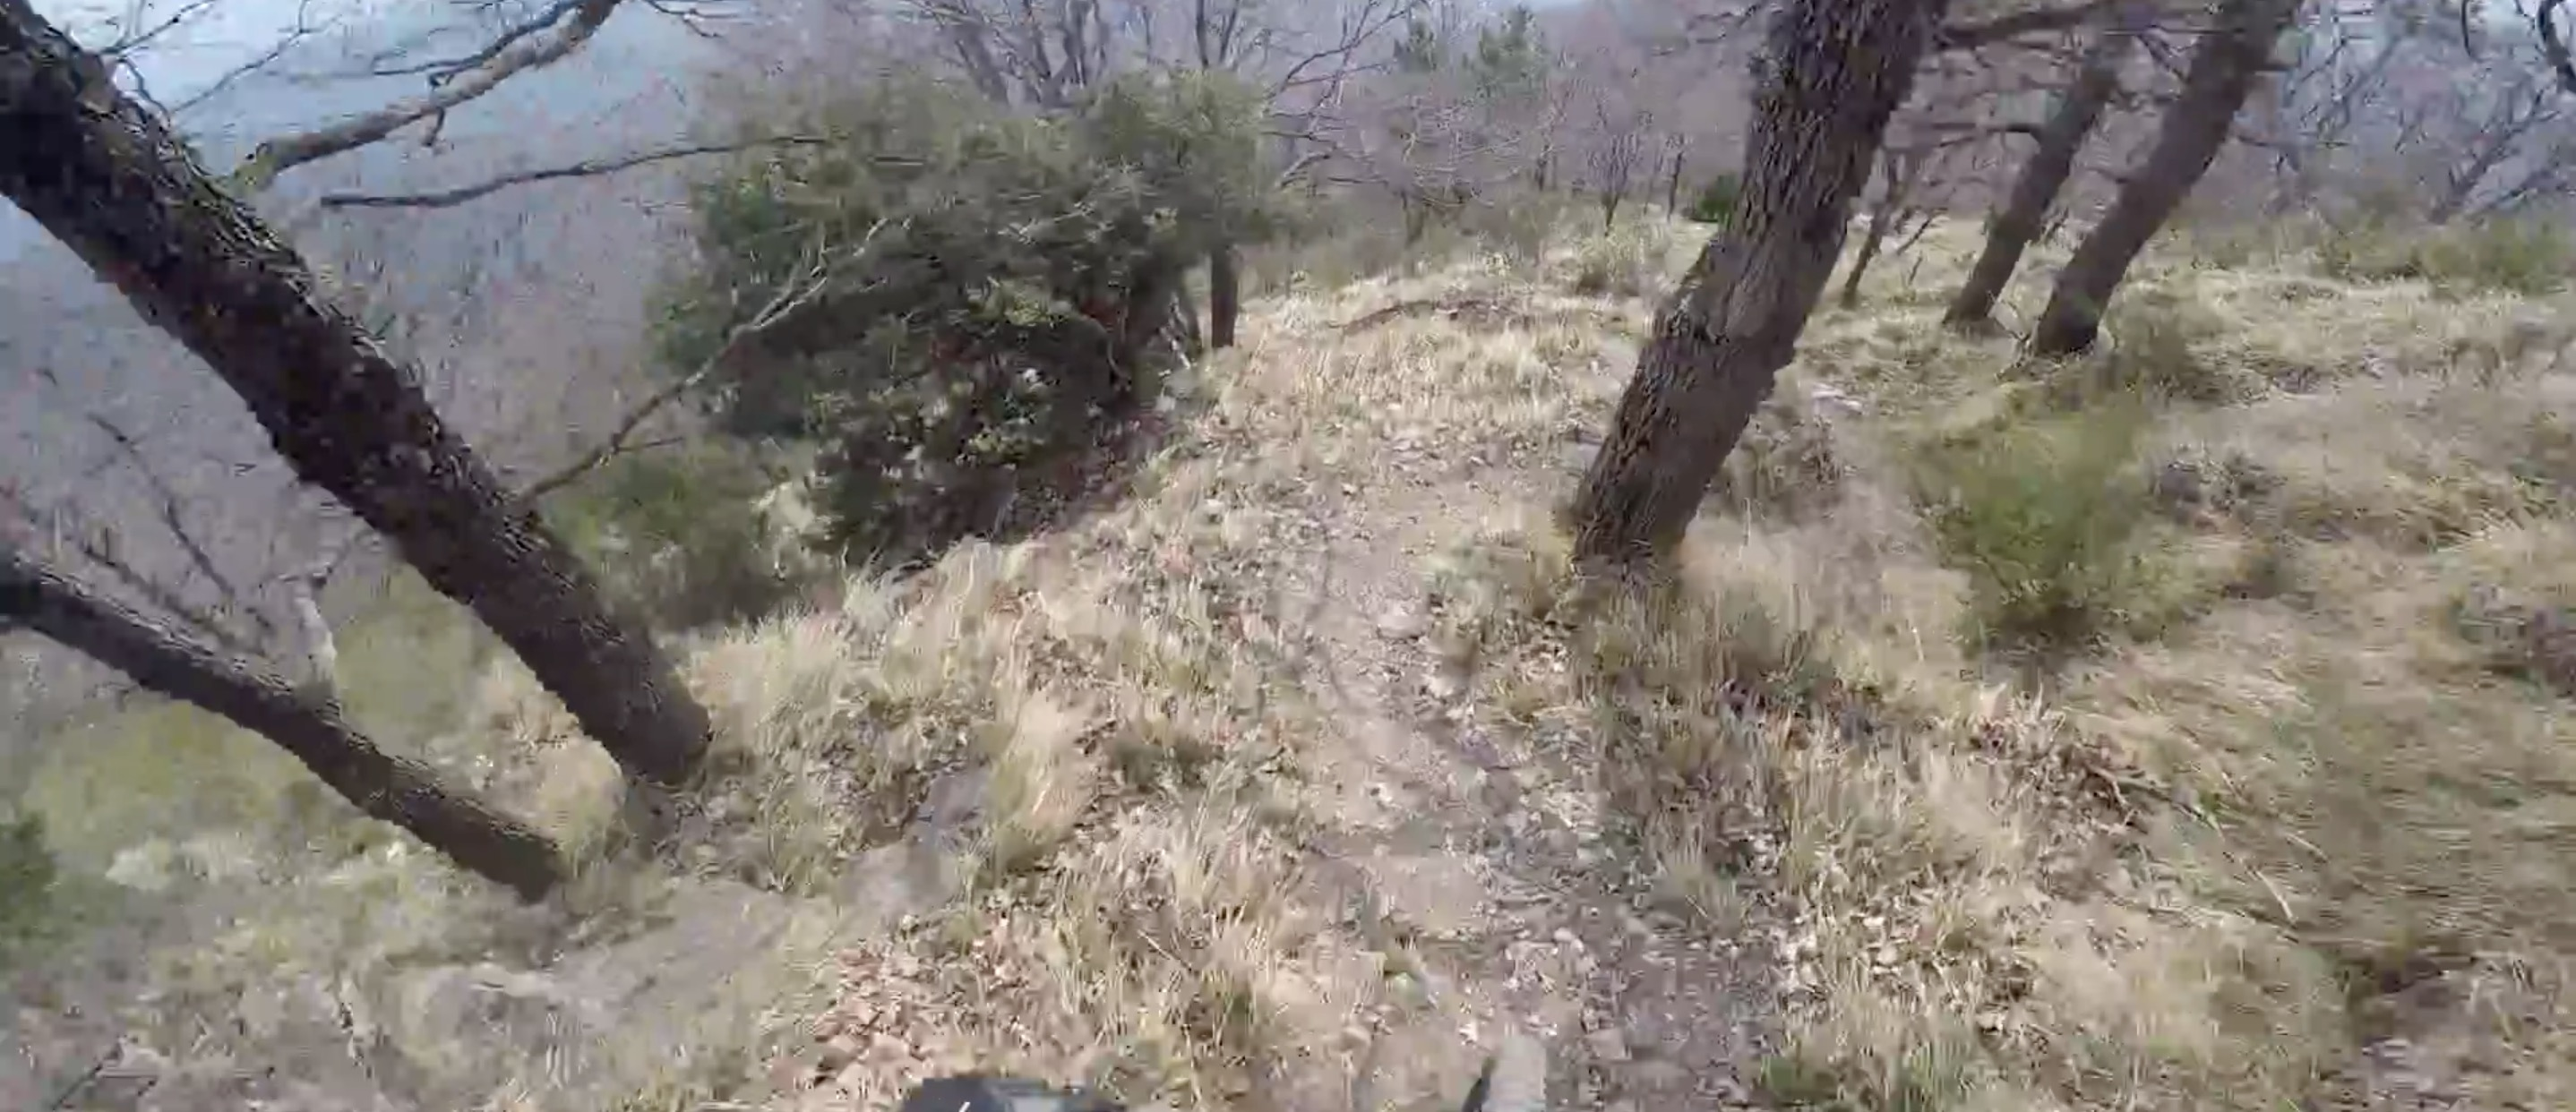 Vidéo / La SP1 du Bévérally en cam' embarquée